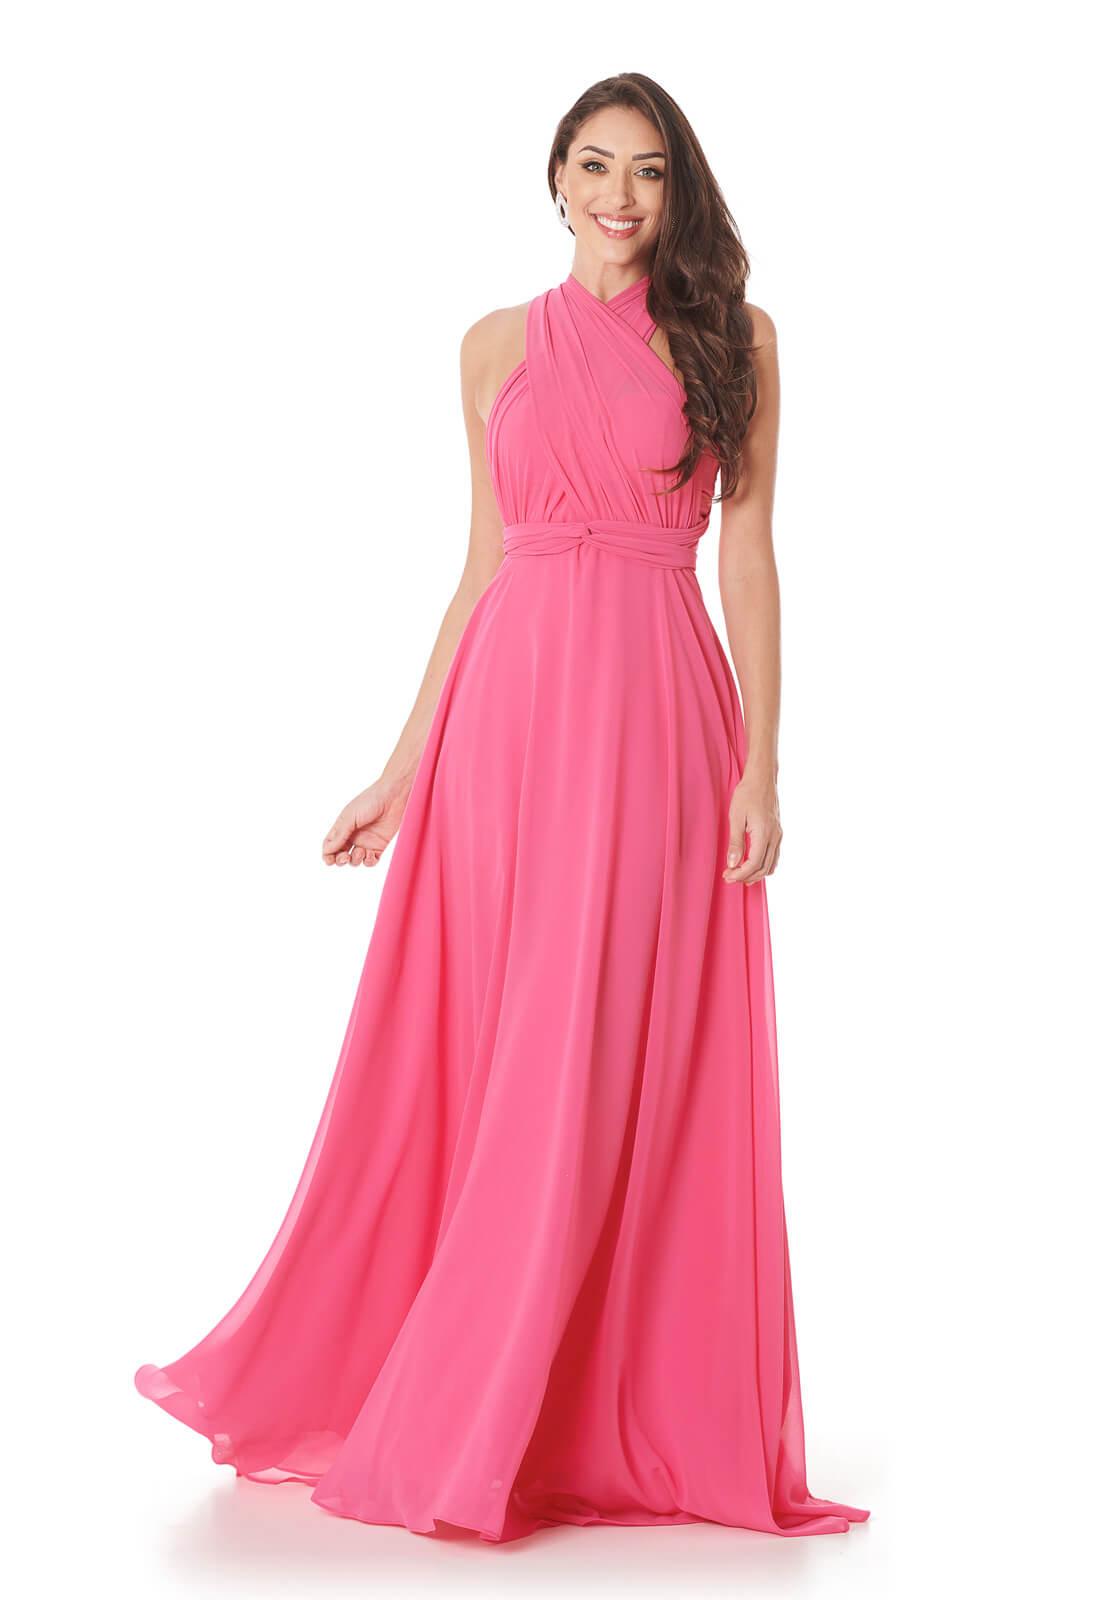 Vestido Mil formas Chiffon Pink Lala Dubi